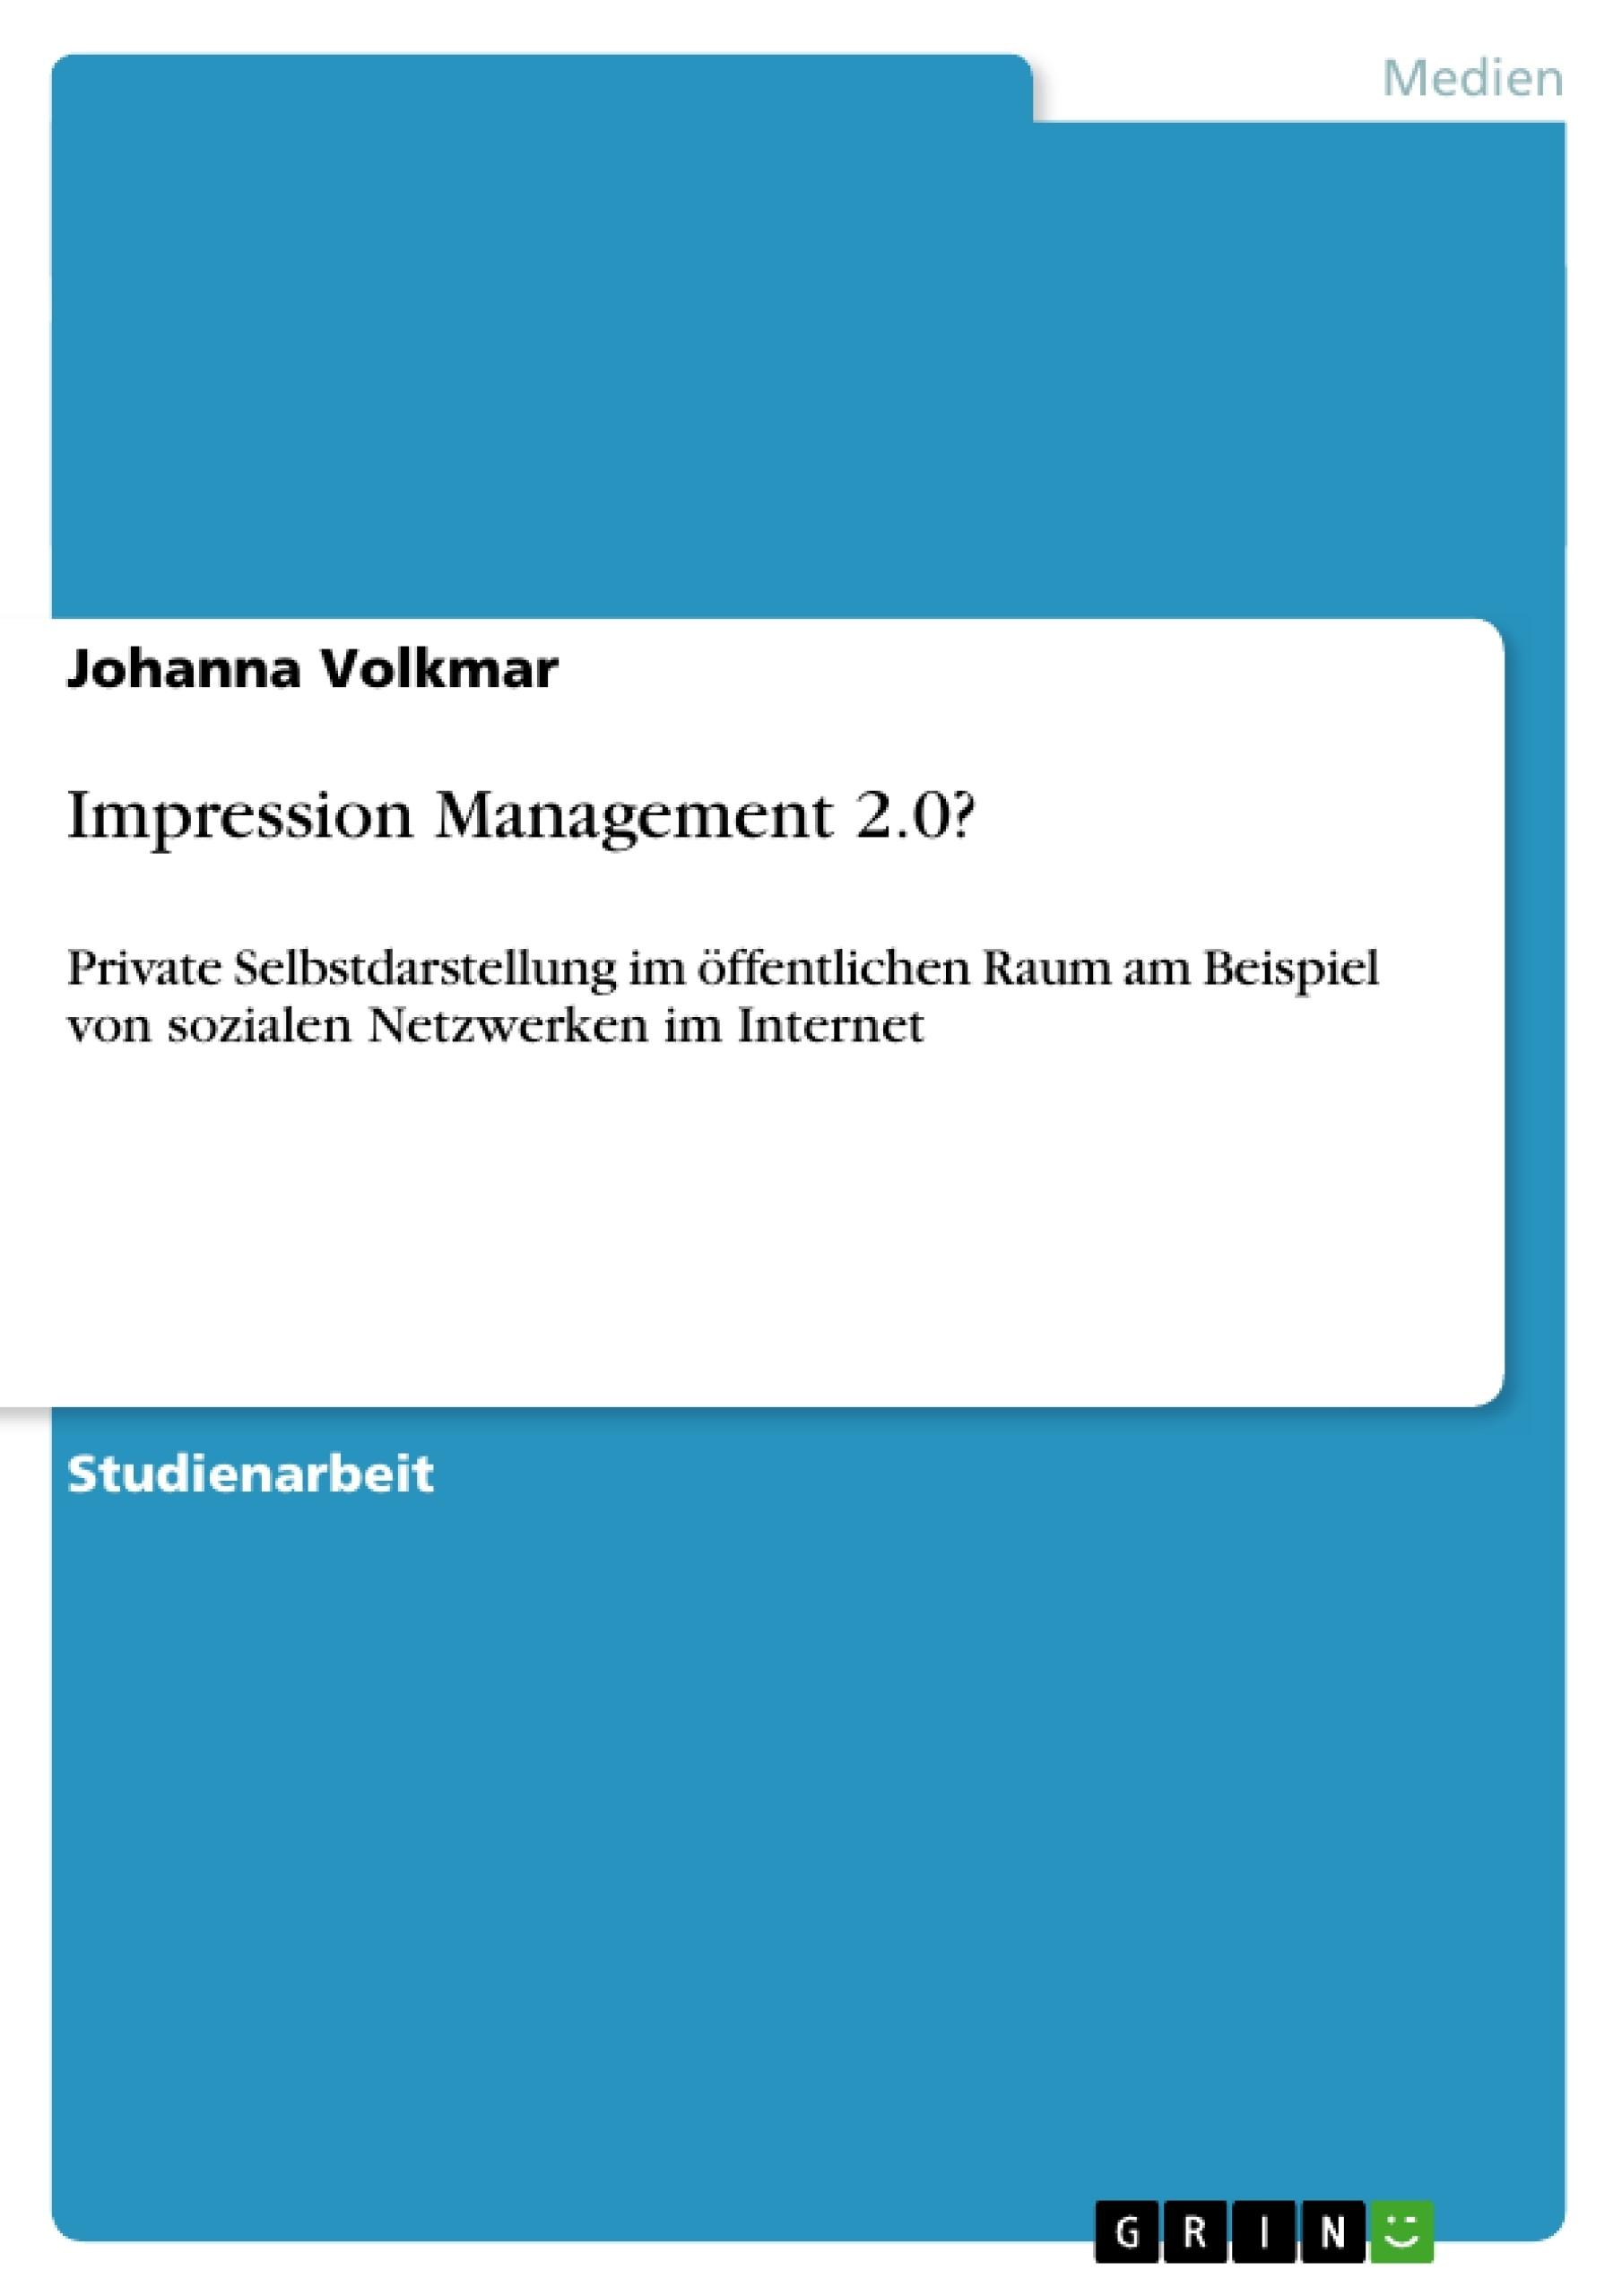 Titel: Impression Management 2.0?